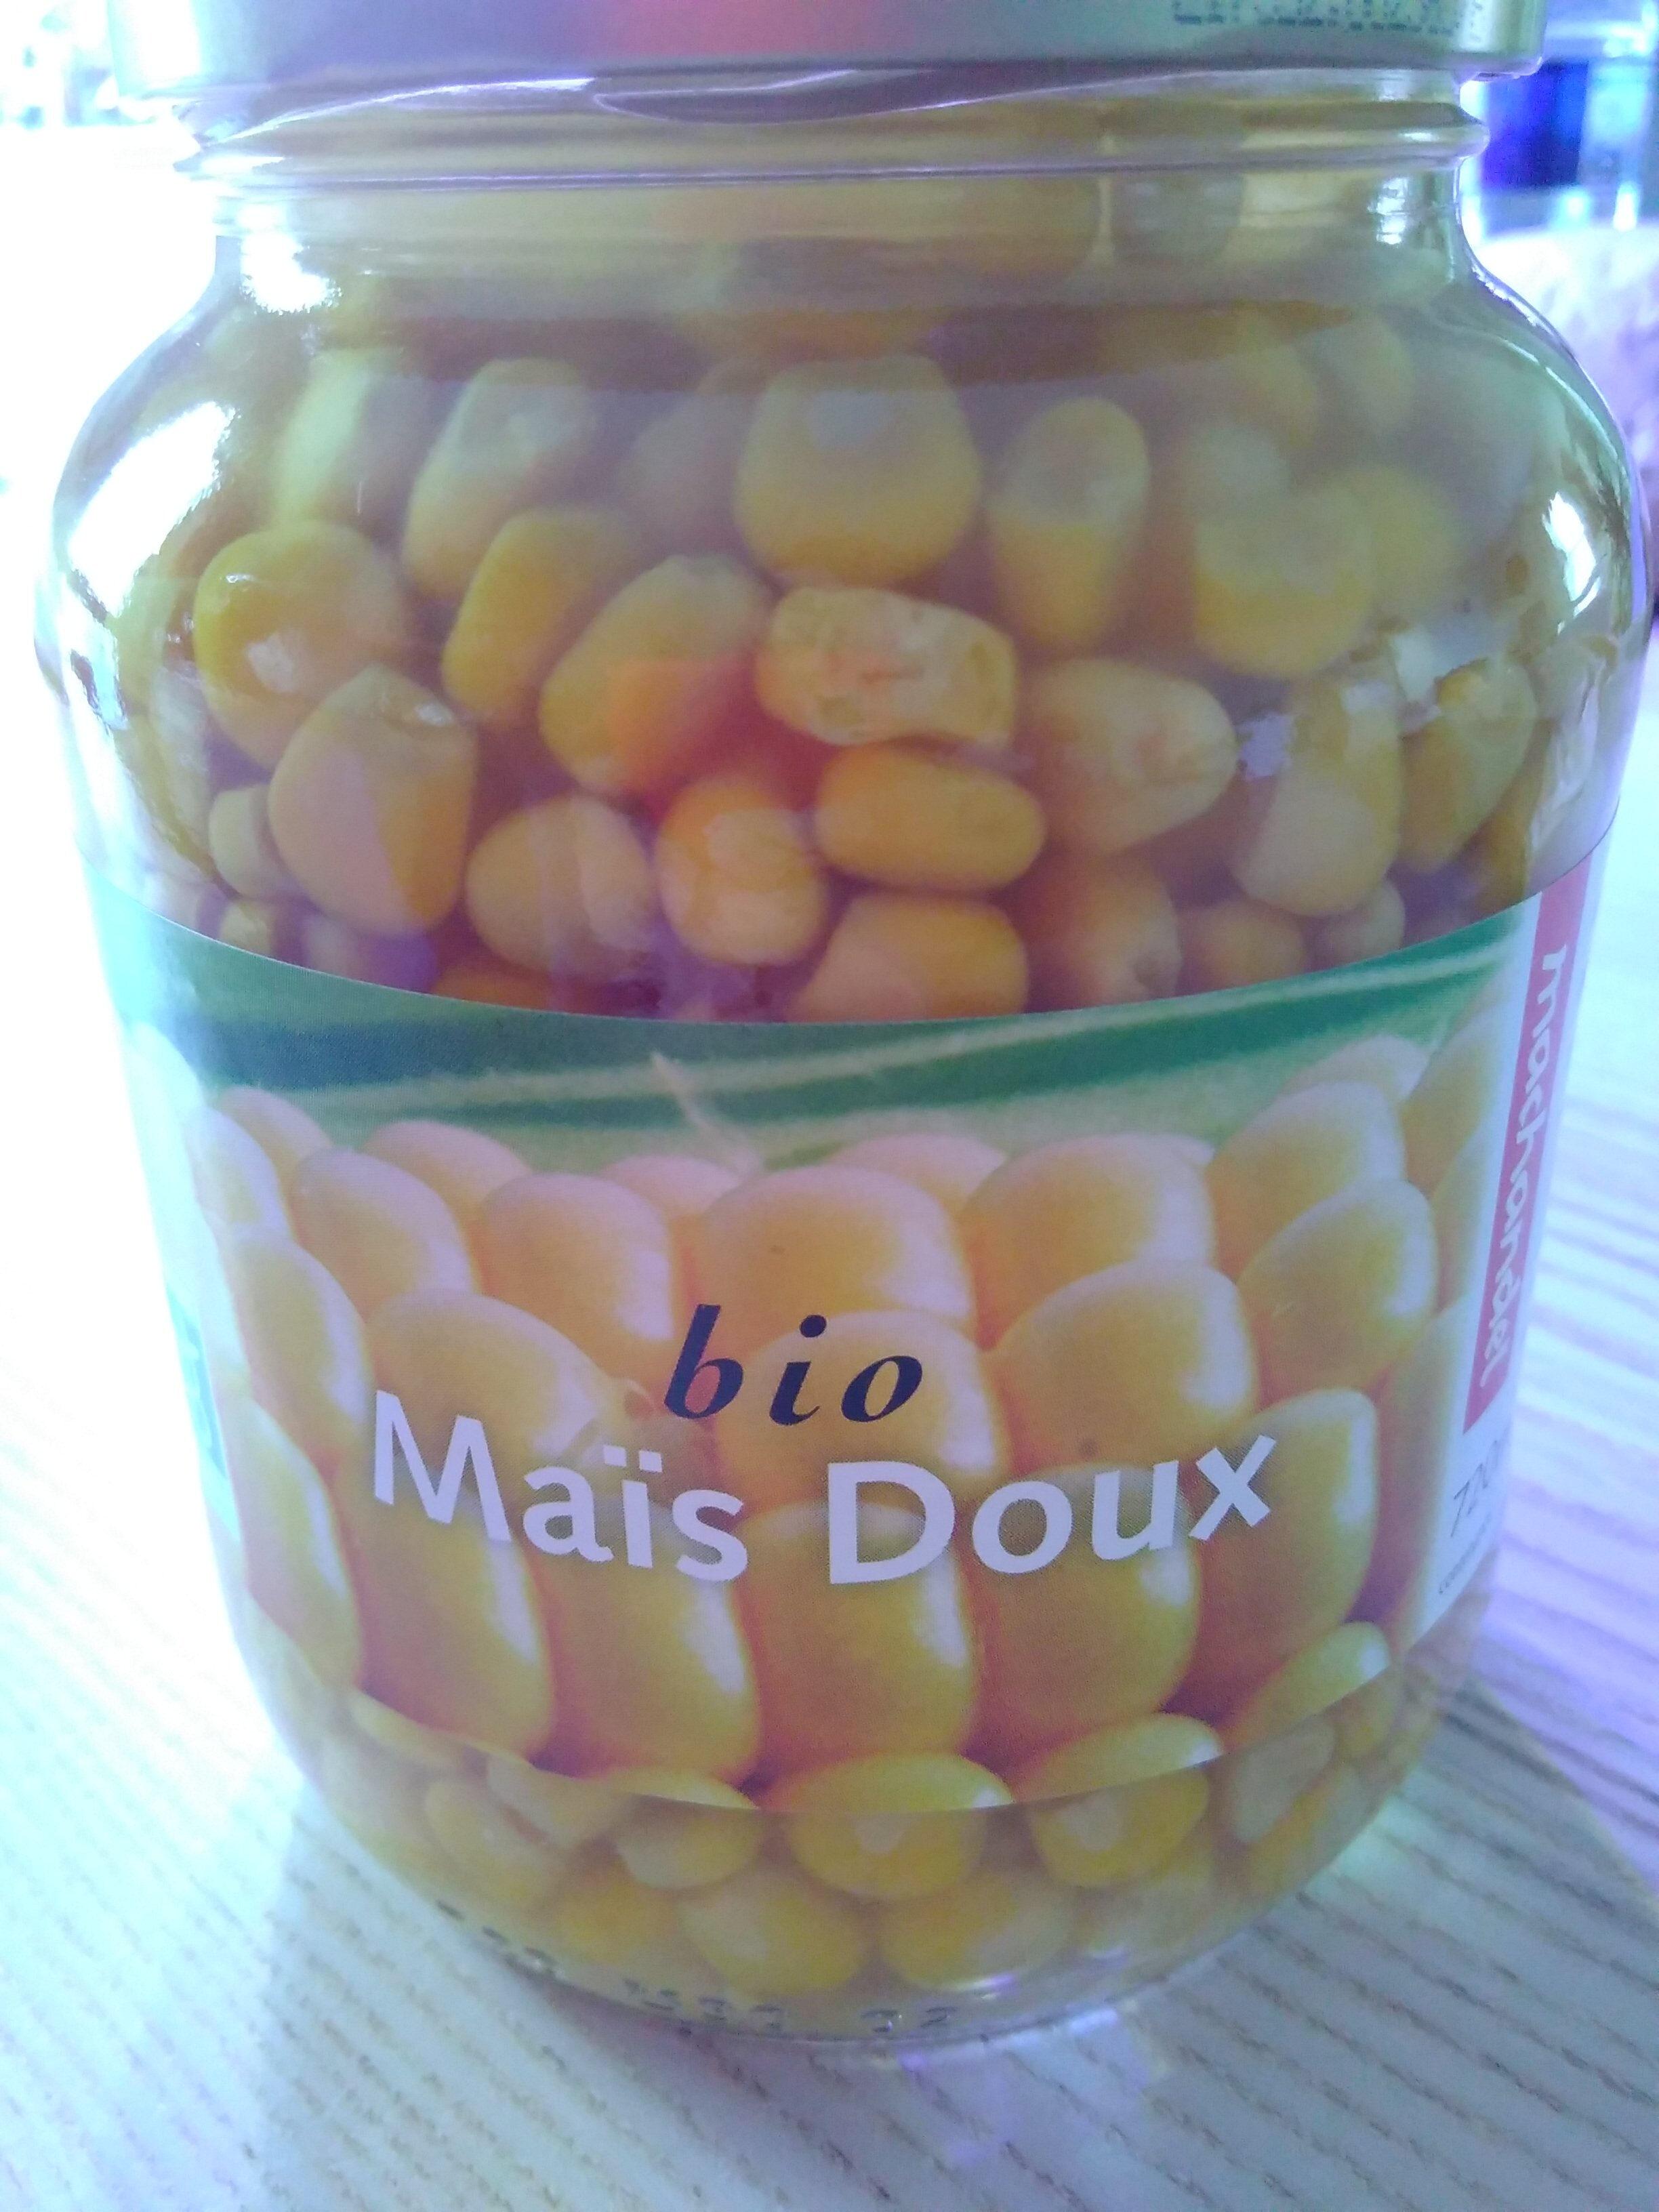 Maïs doux - Product - fr